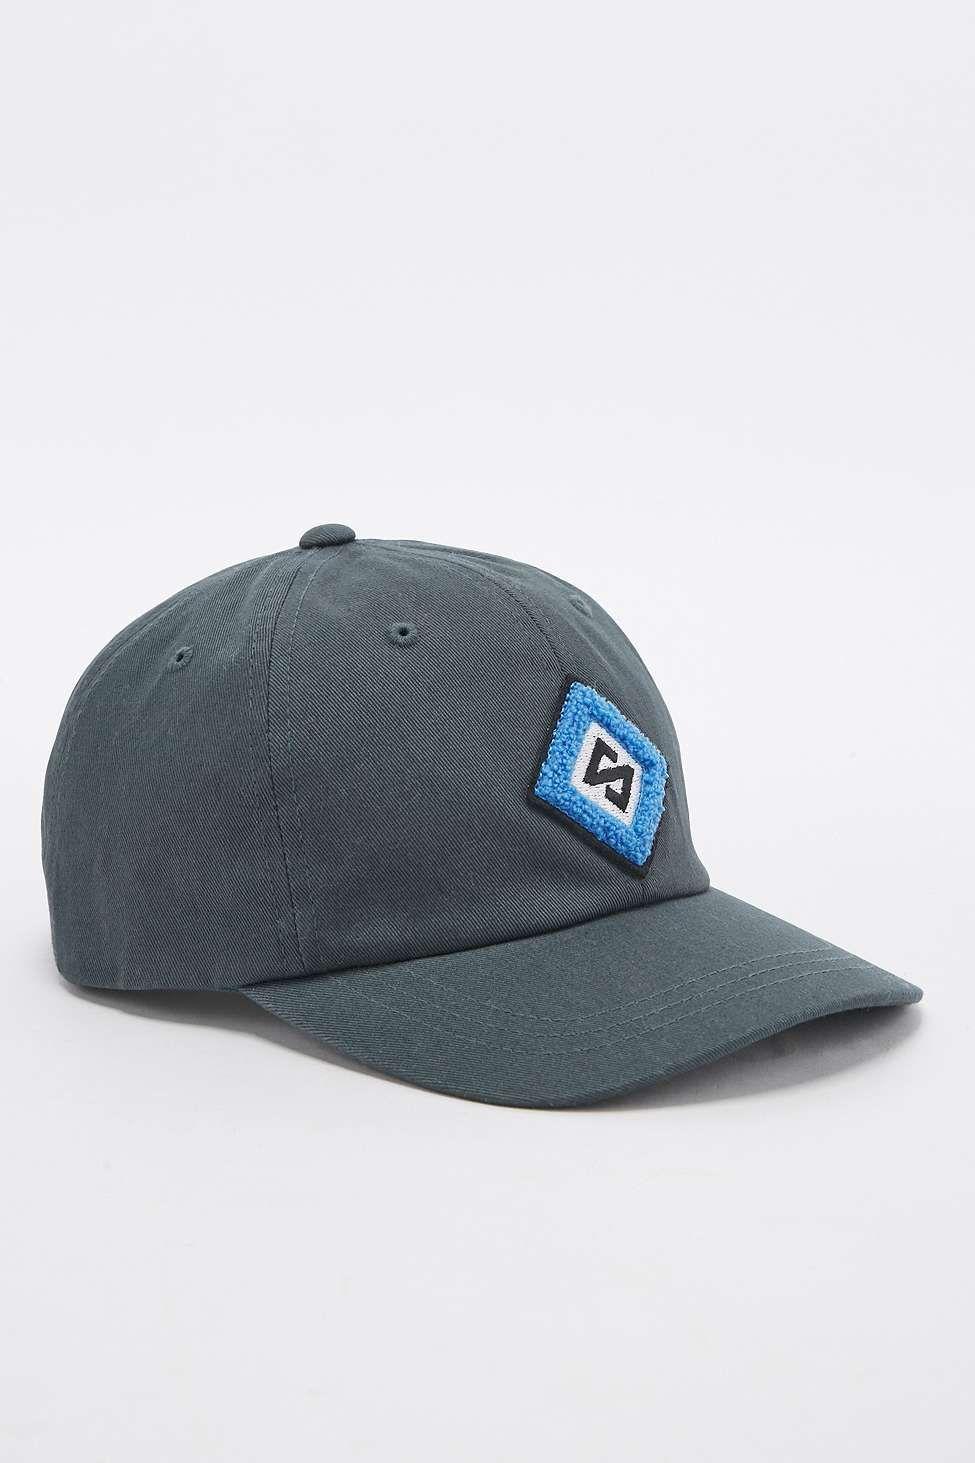 6cc822689a6 Stussy Chenille Diamond Logo Green Cap